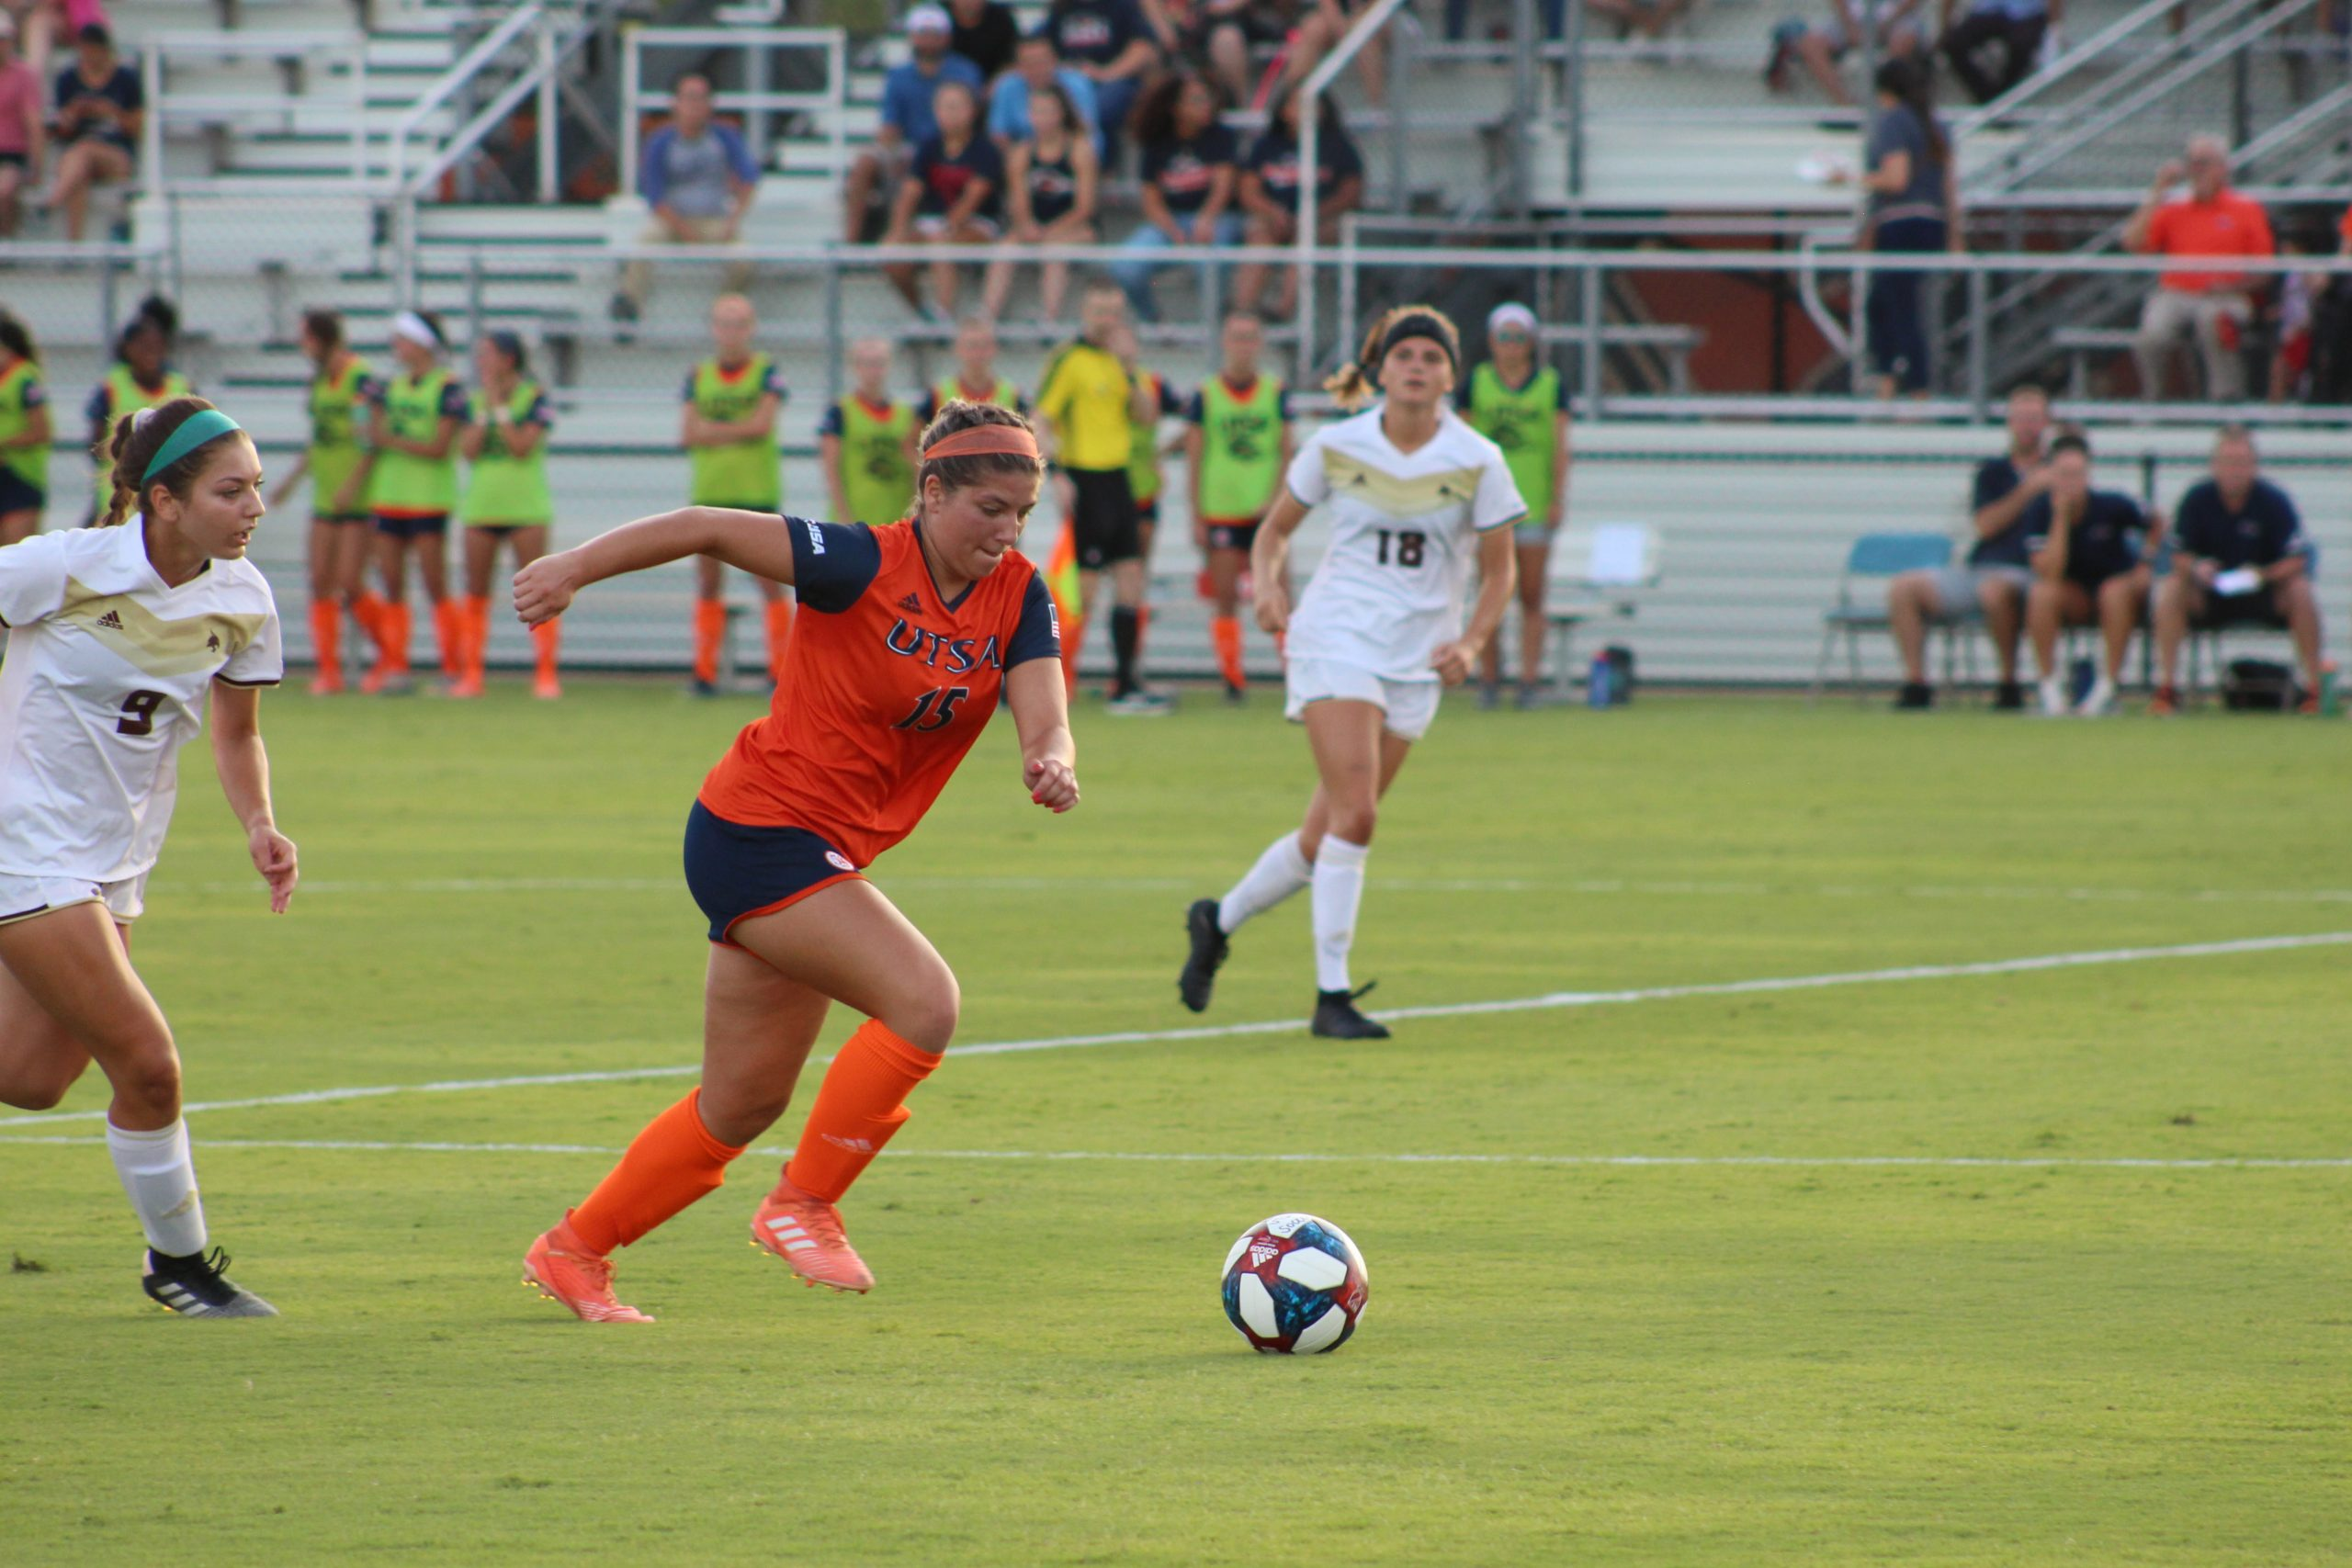 Jordyn Lacey brings the ball up the field. Julia Maenius